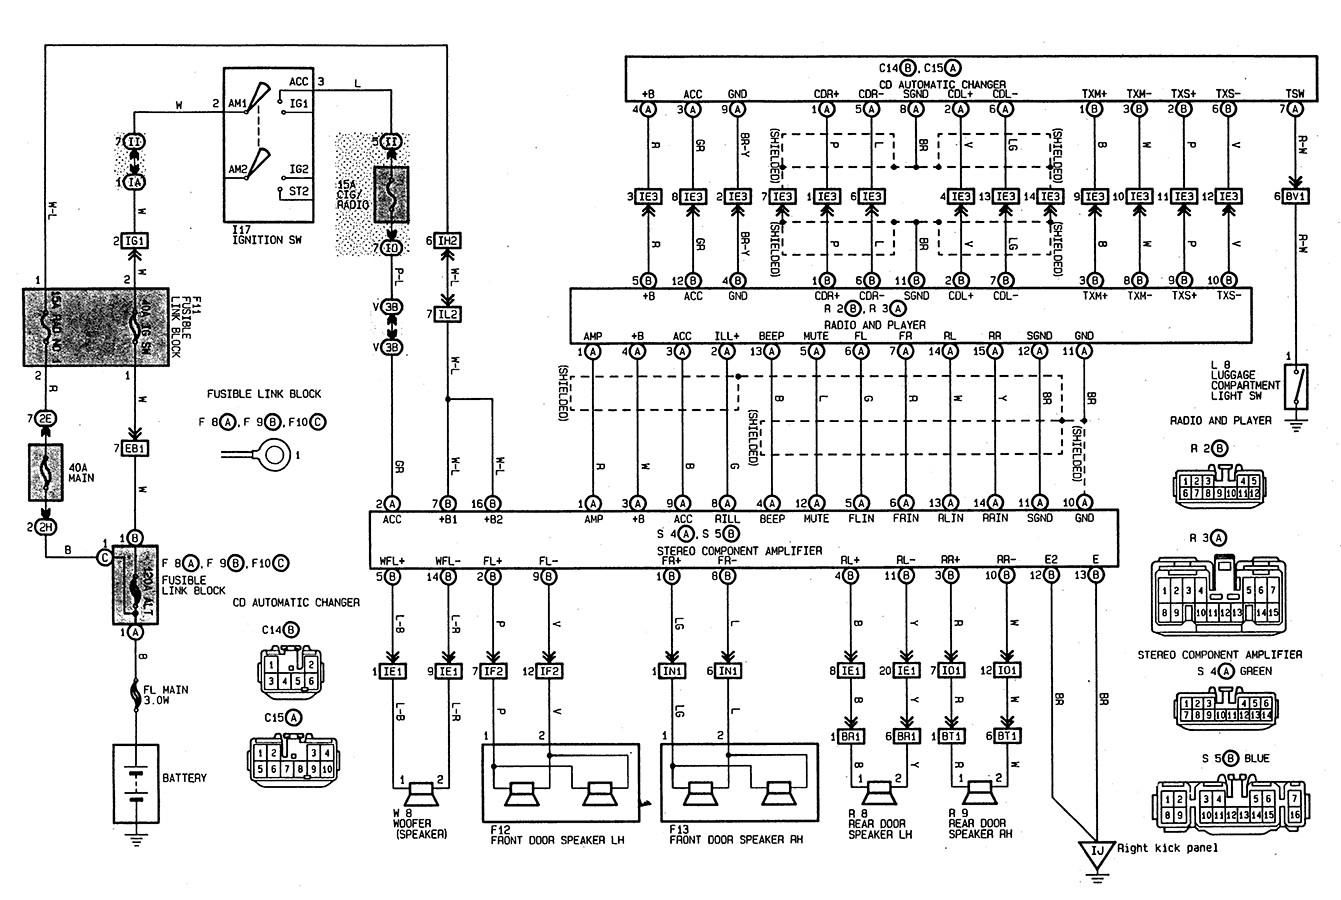 Toyota Tacoma Radio Wiring Diagram Collection